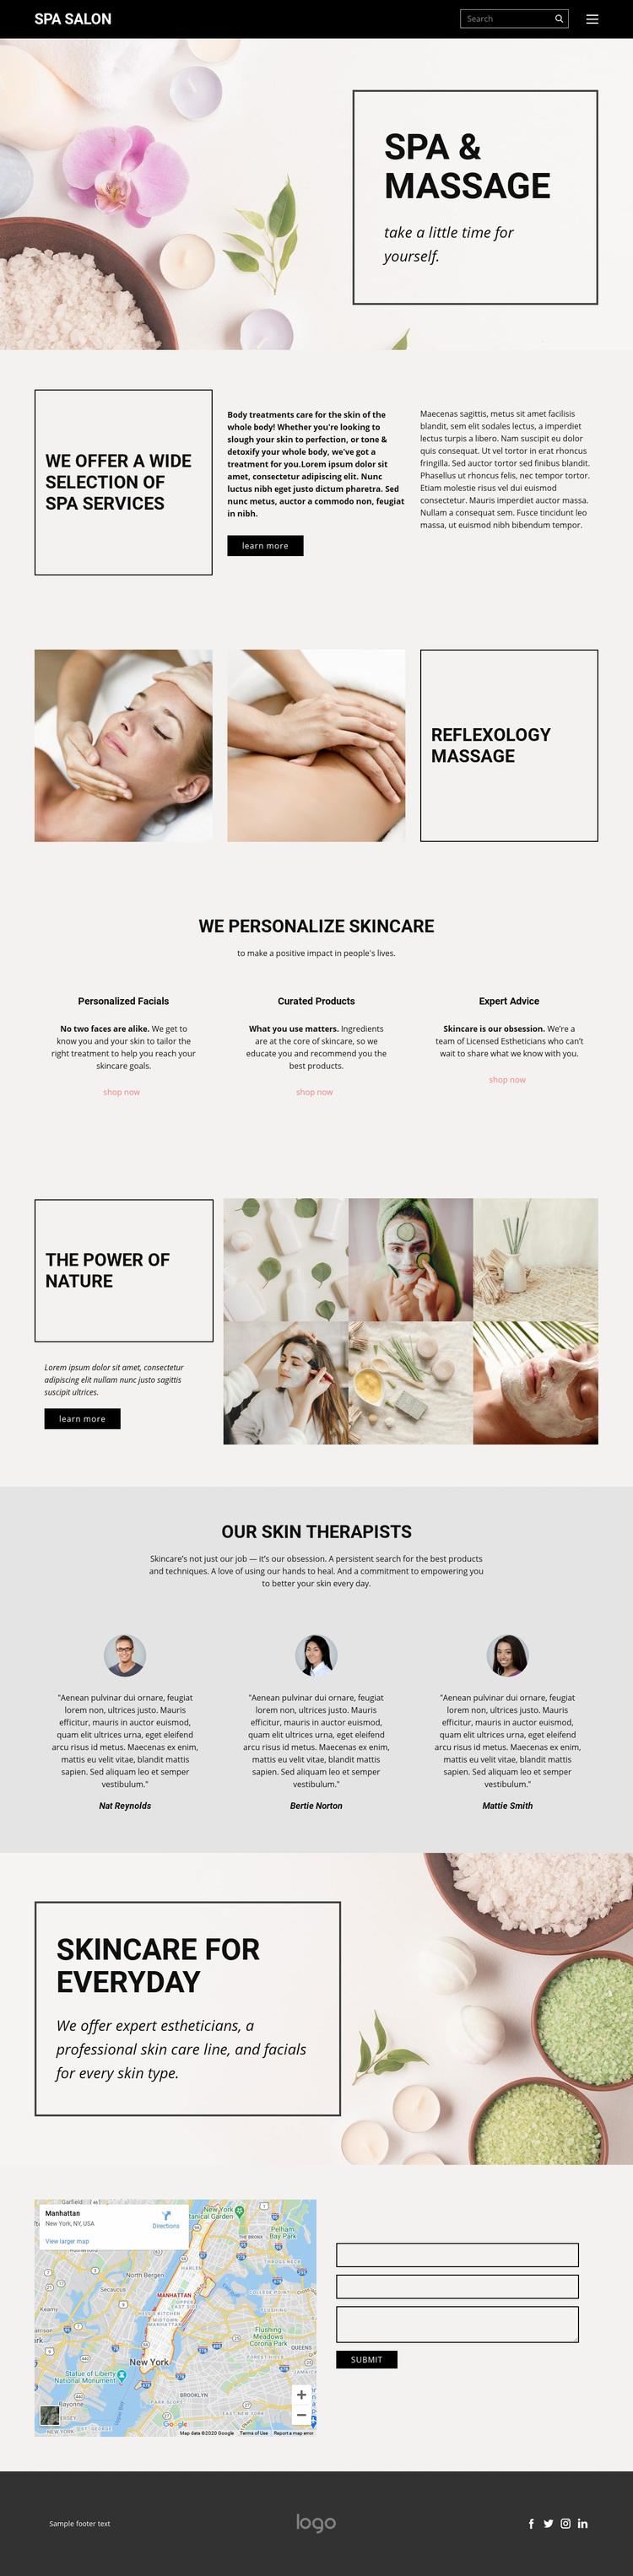 SPA and massage Web Page Designer